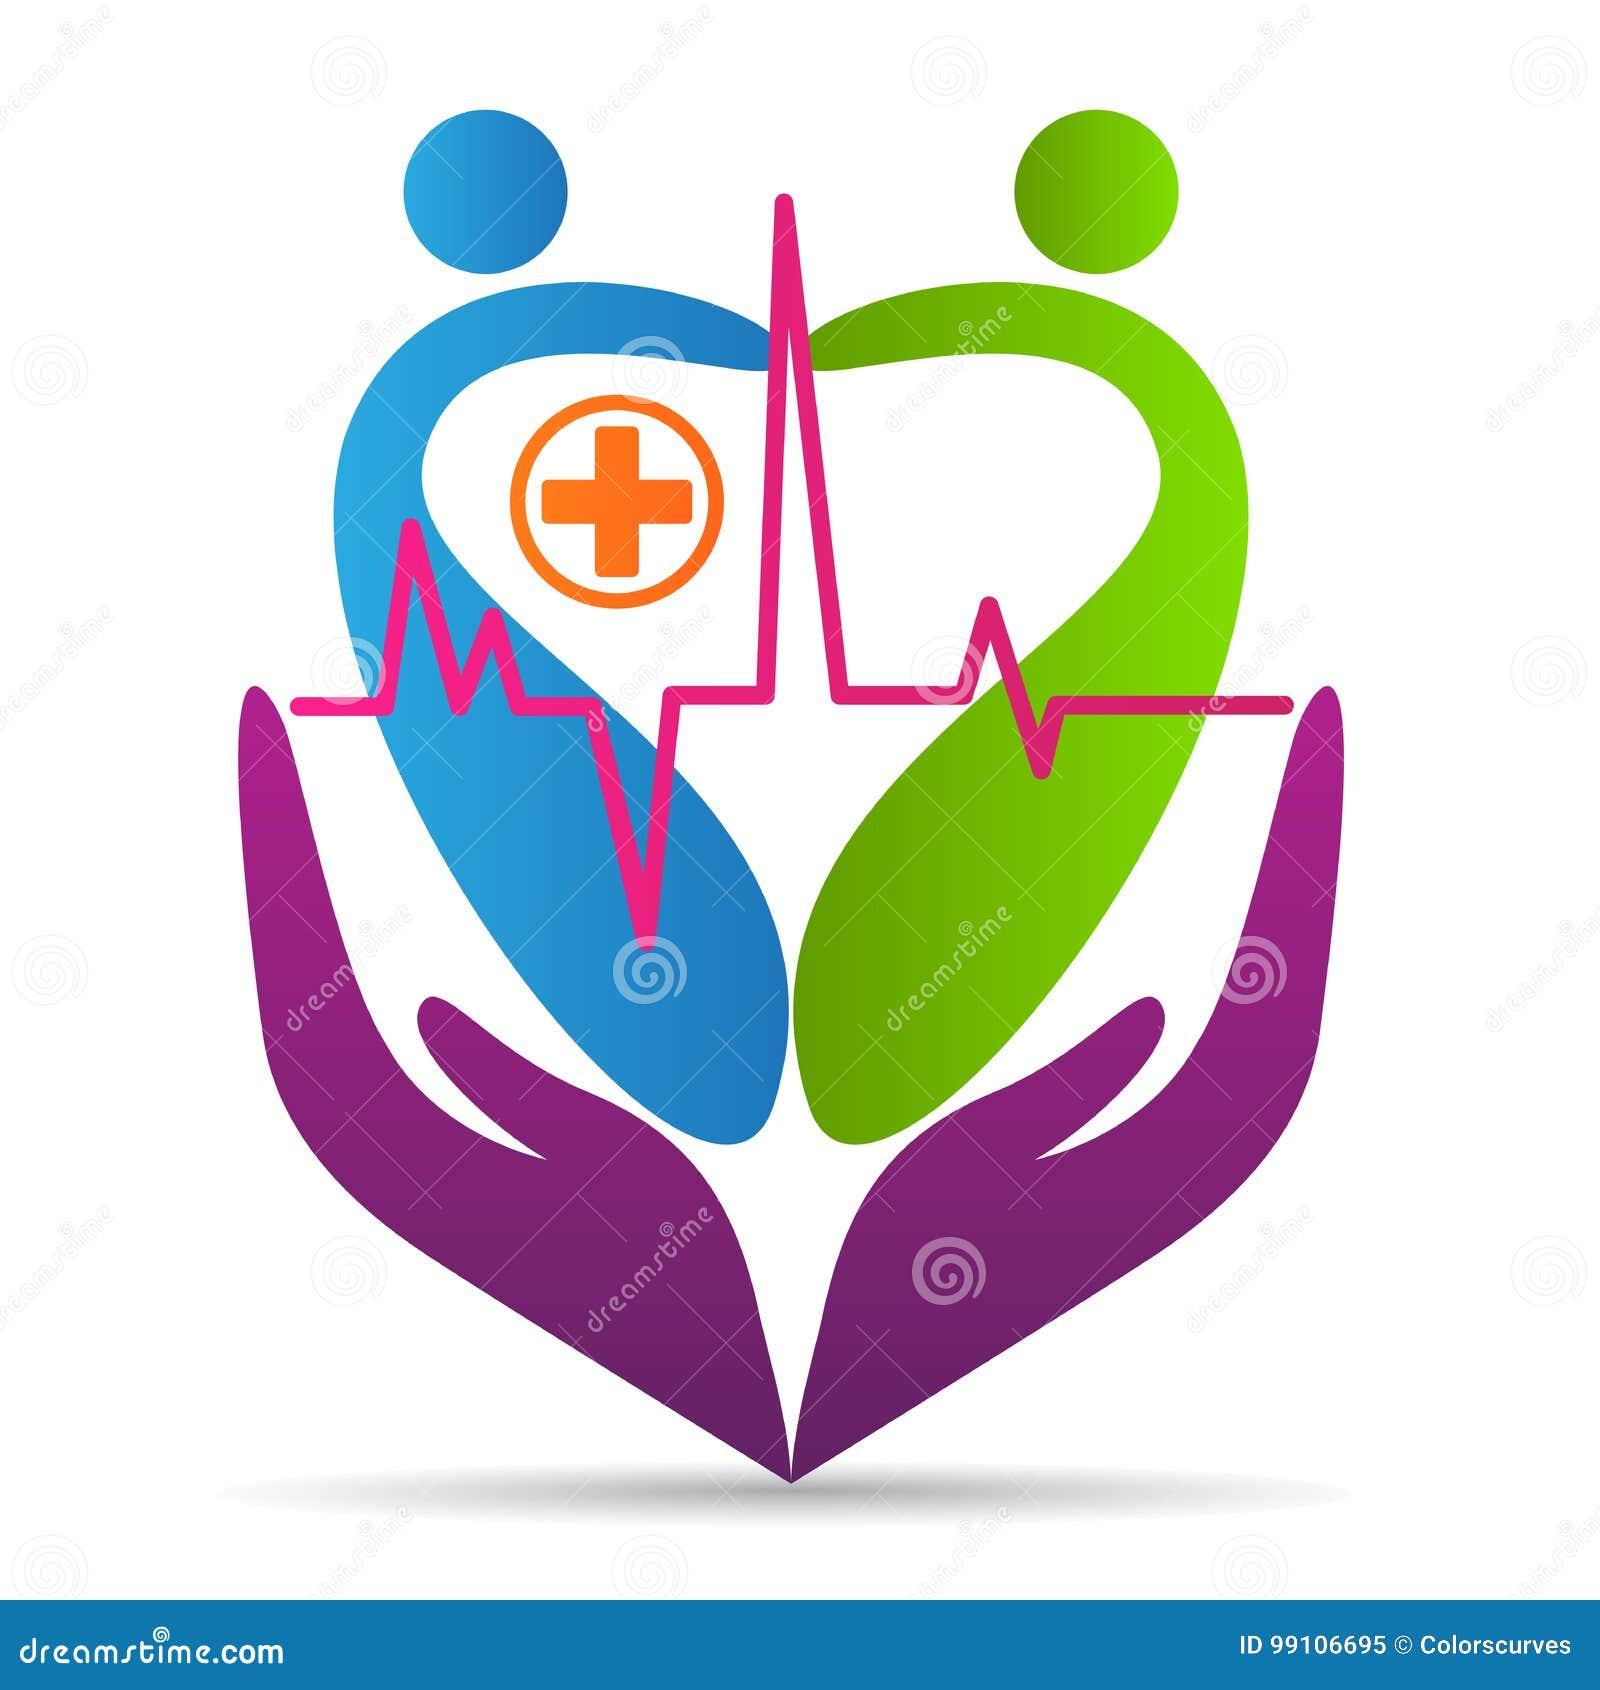 People Heart Care Logo Wellness Healthcare Love Hospital Symbol